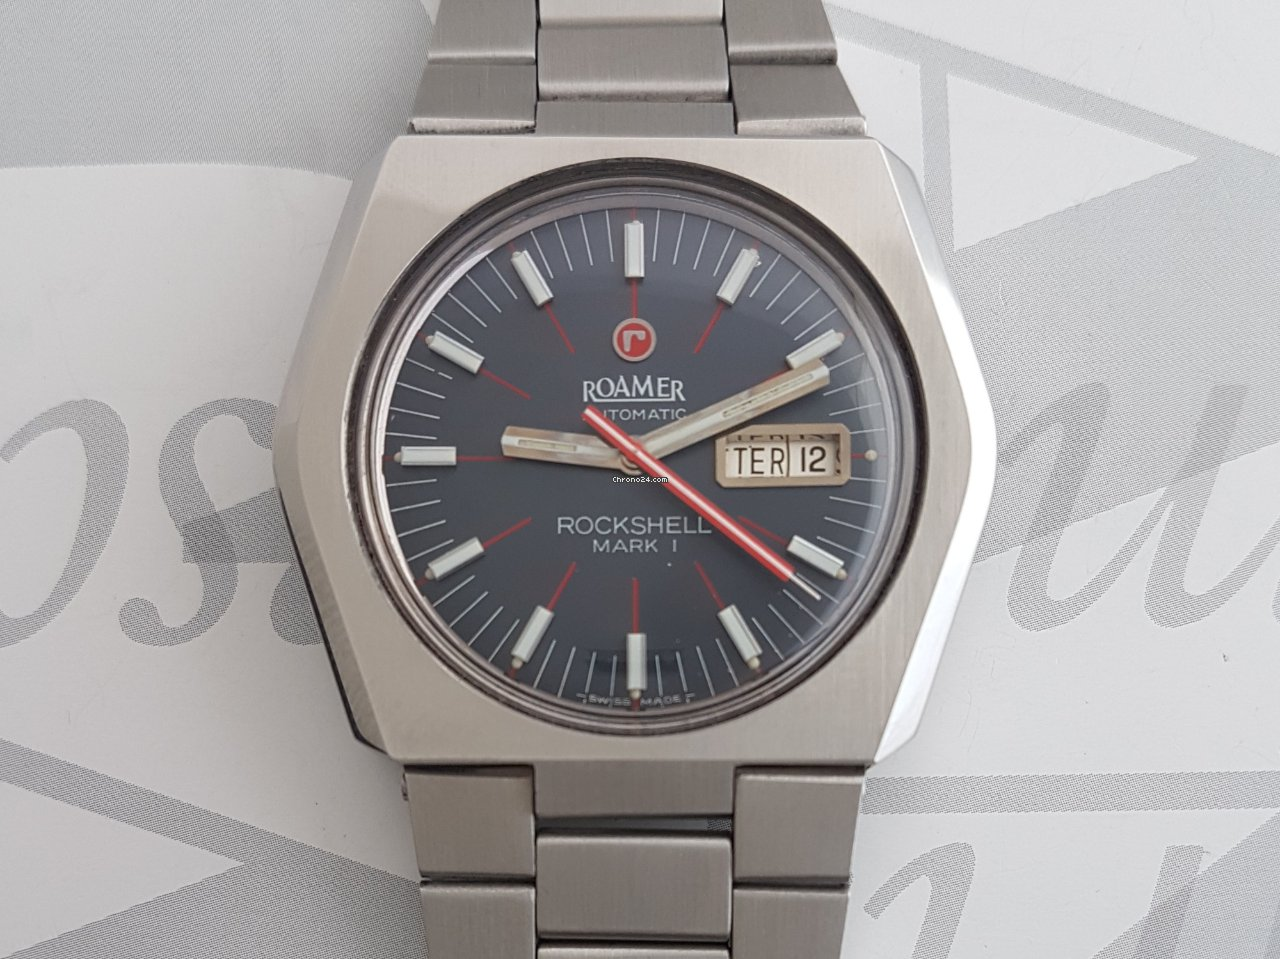 58cb678134af Relojes Roamer - Precios de todos los relojes Roamer en Chrono24